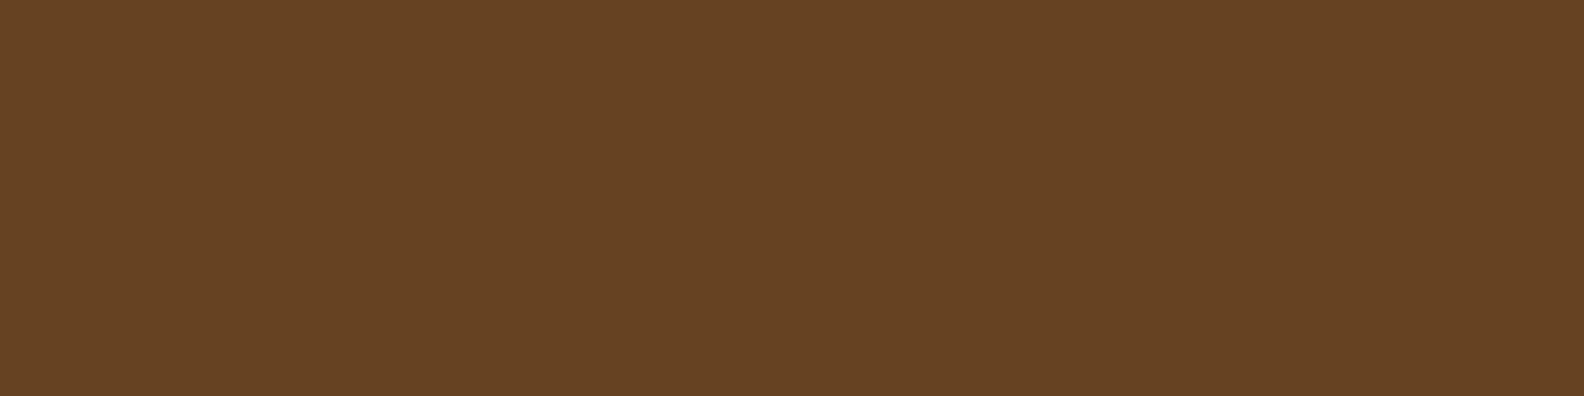 1584x396 Dark Brown Solid Color Background